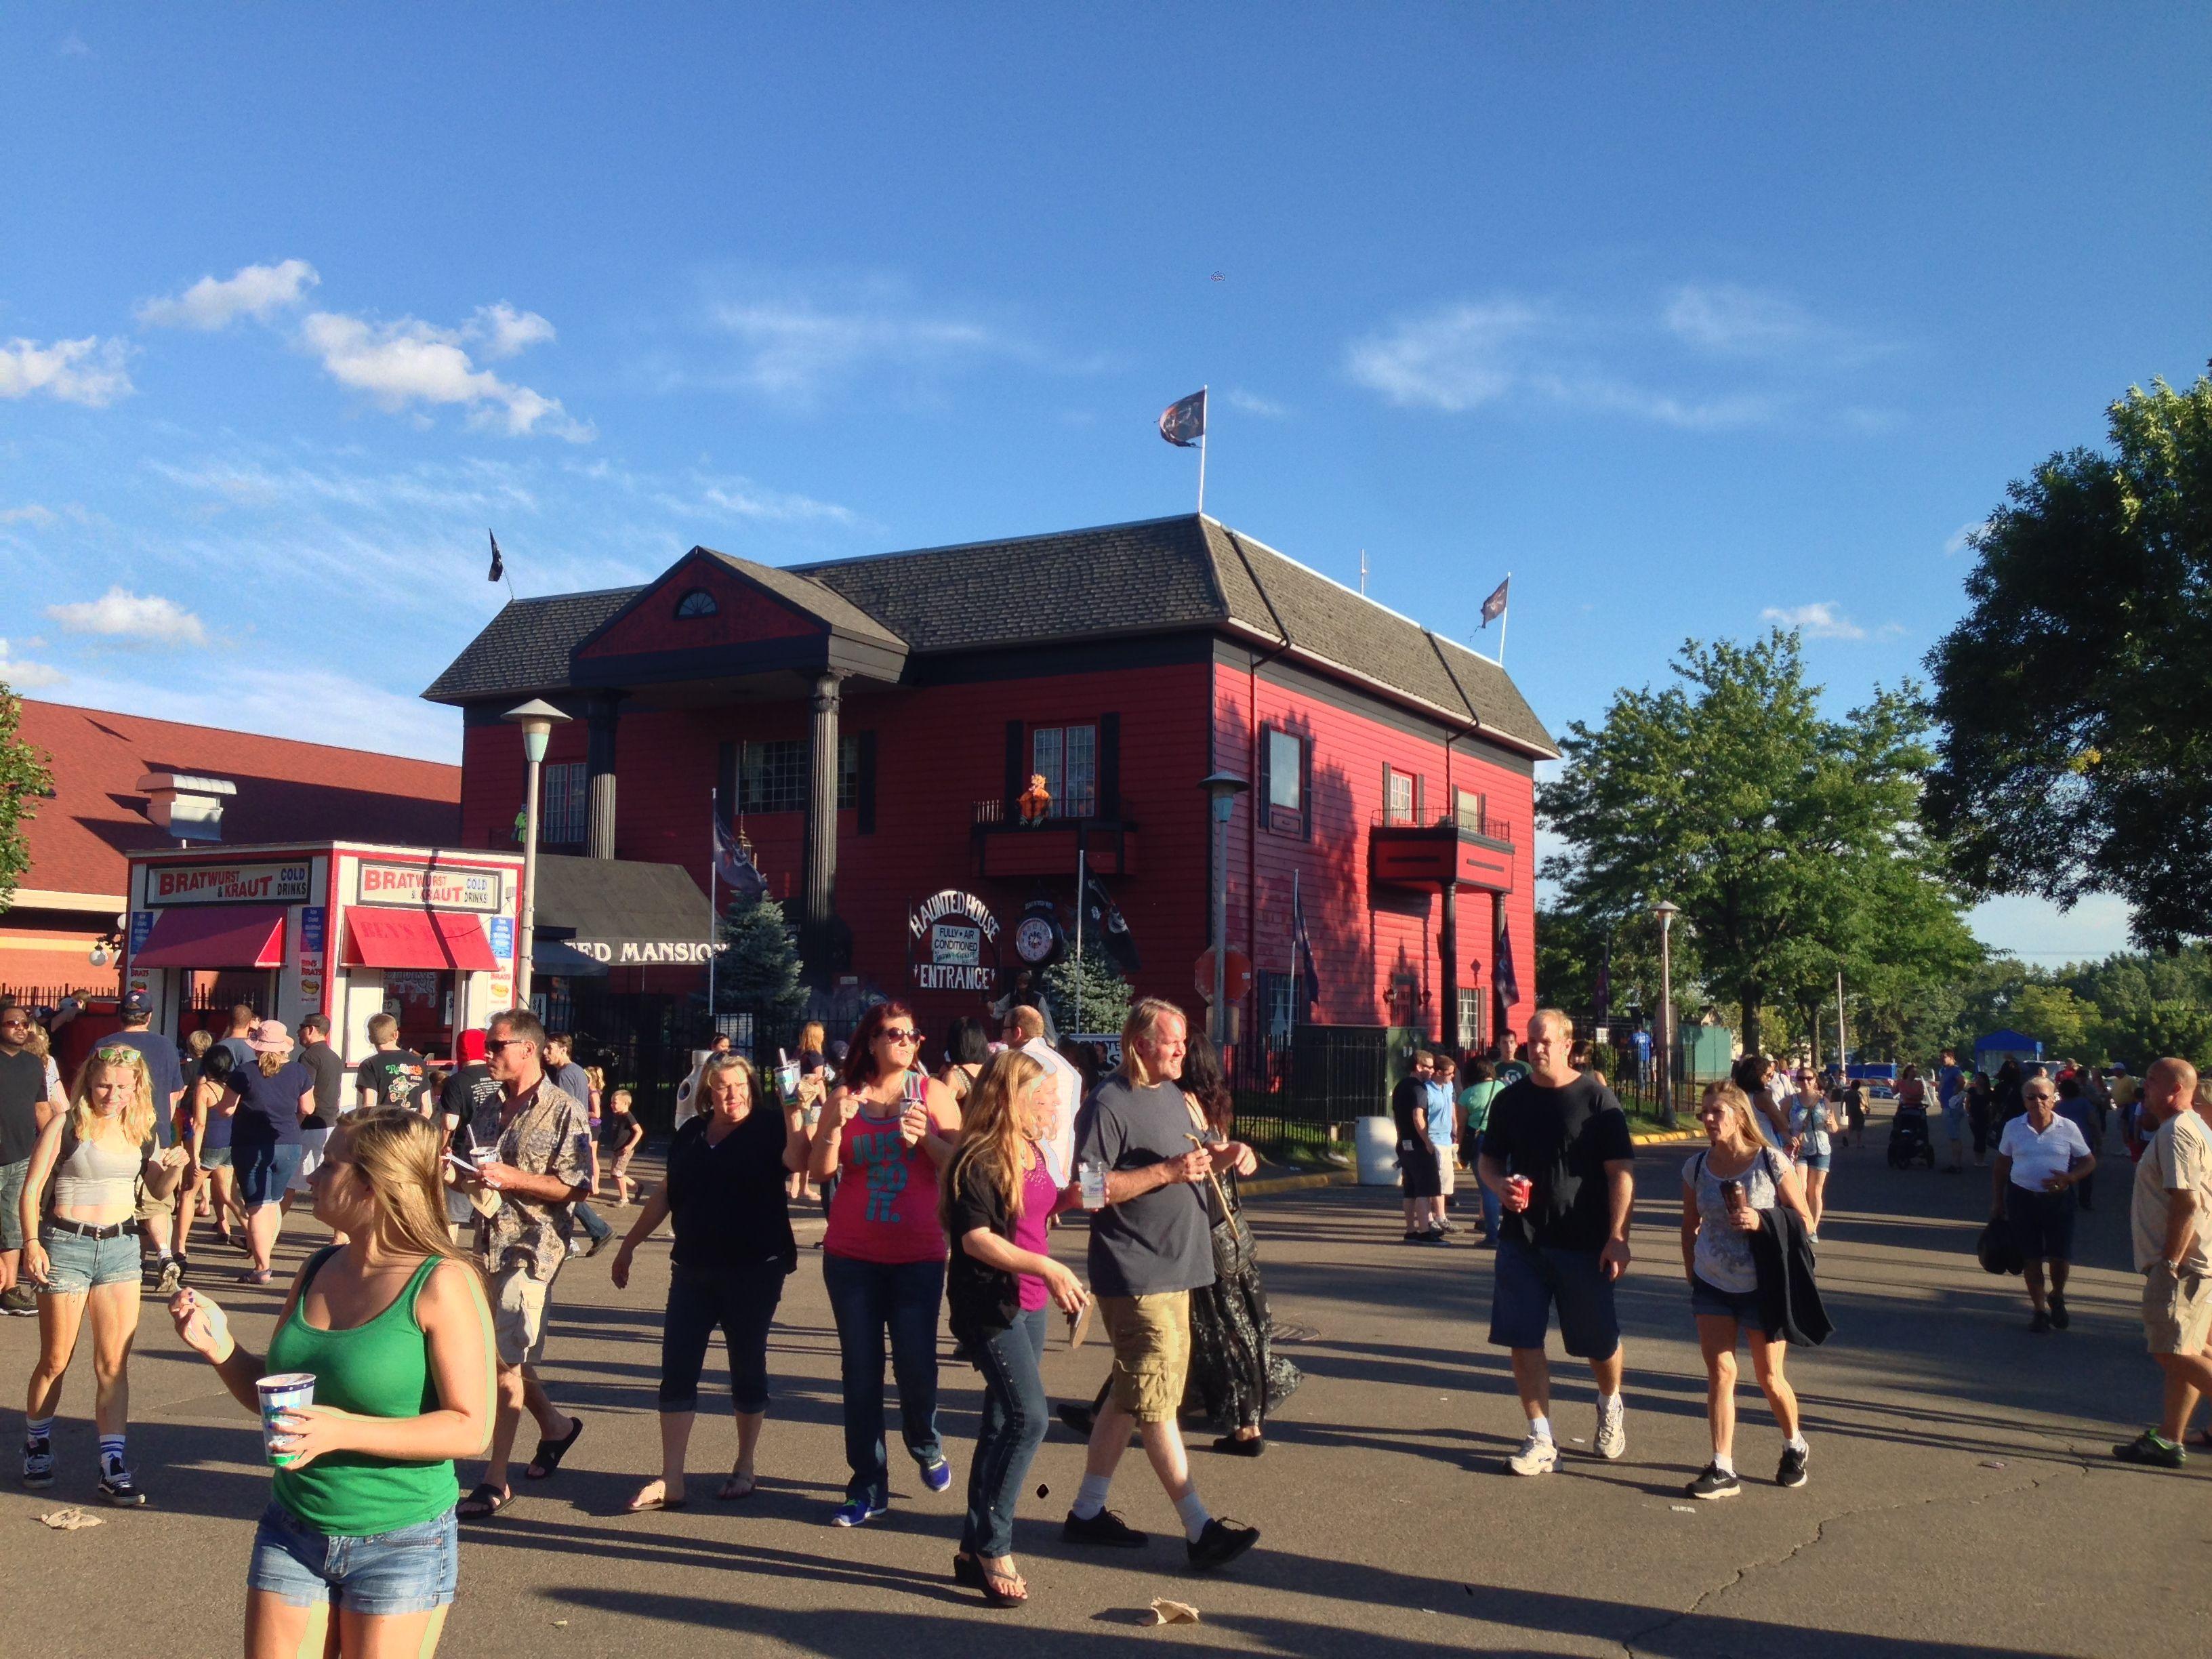 Minnesota State Fair - Haunted House